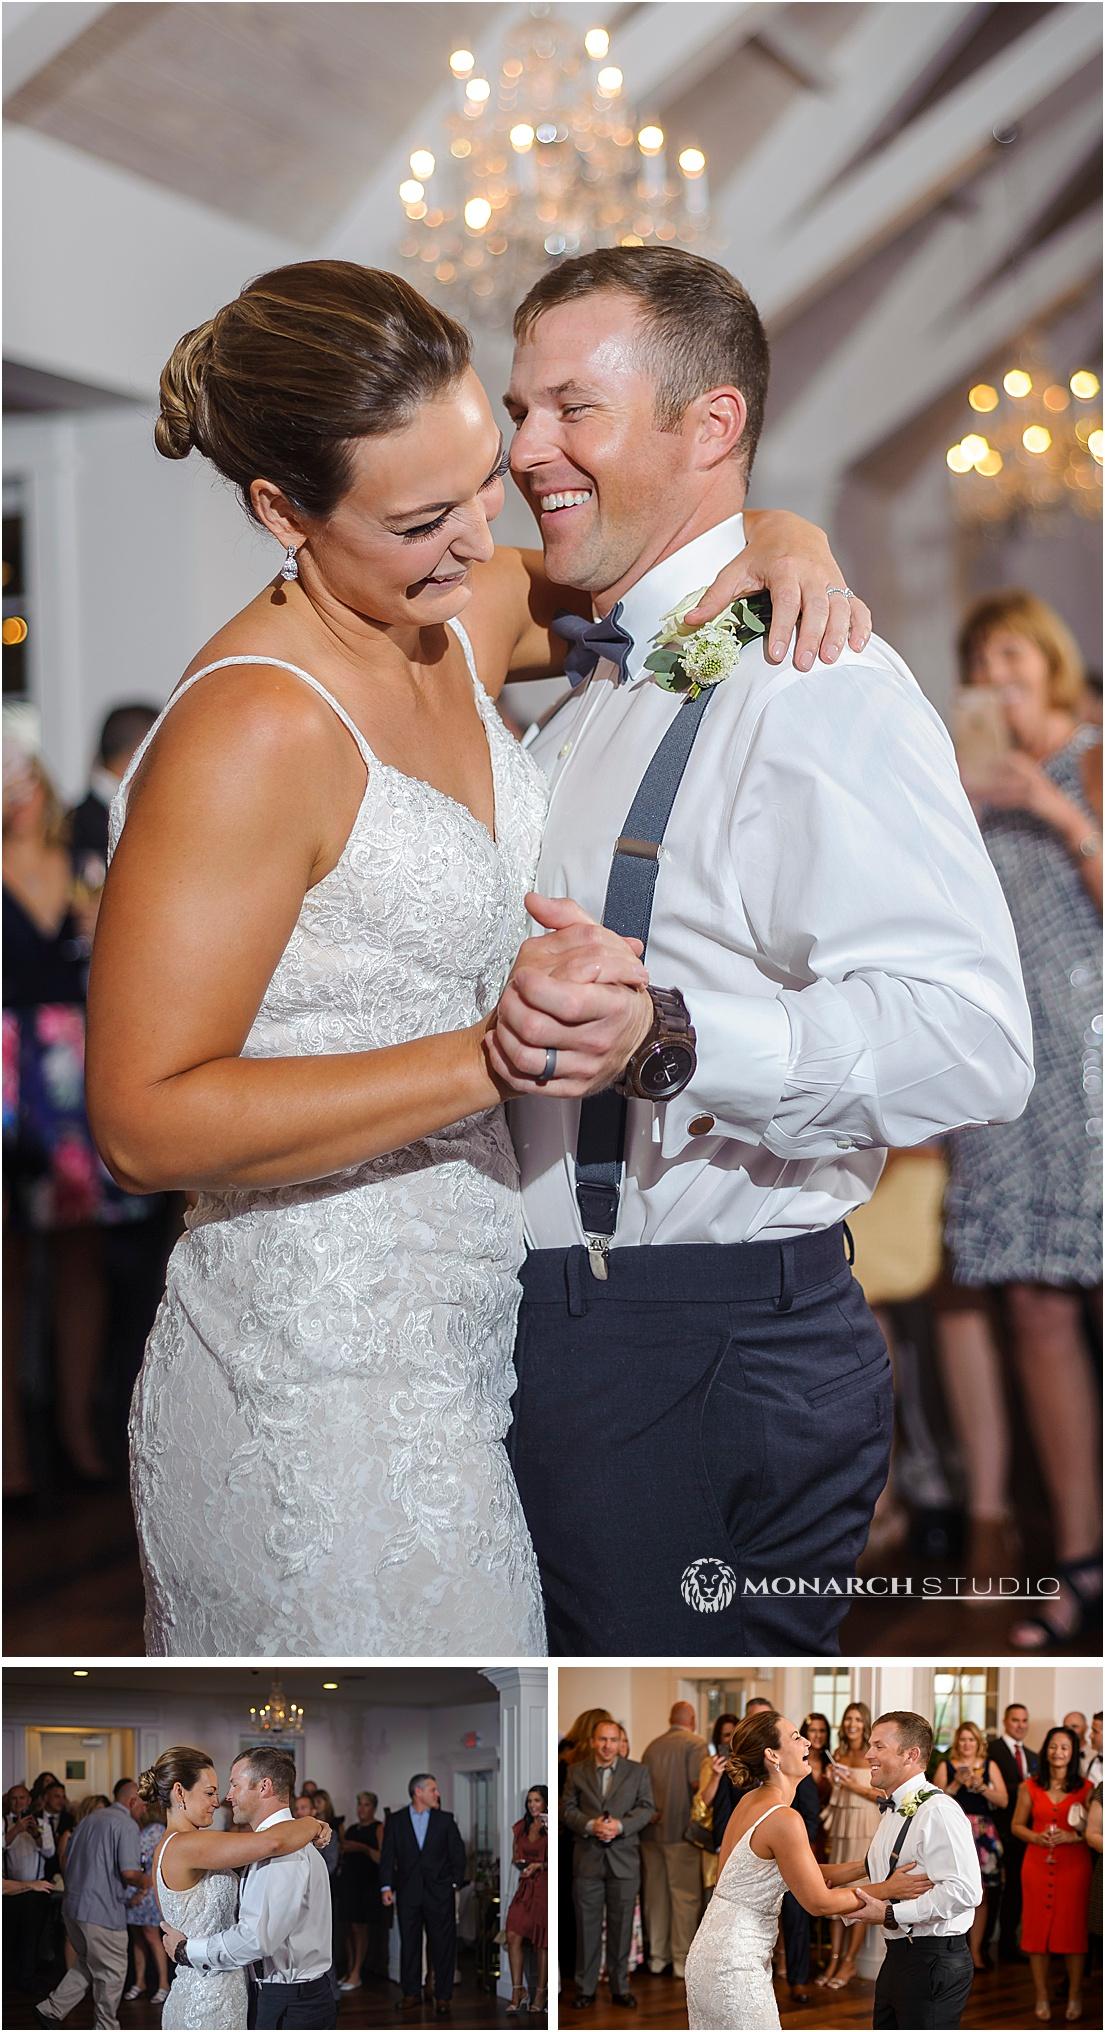 093-whiteroom-wedding-photographer-2019-05-22_0075.jpg